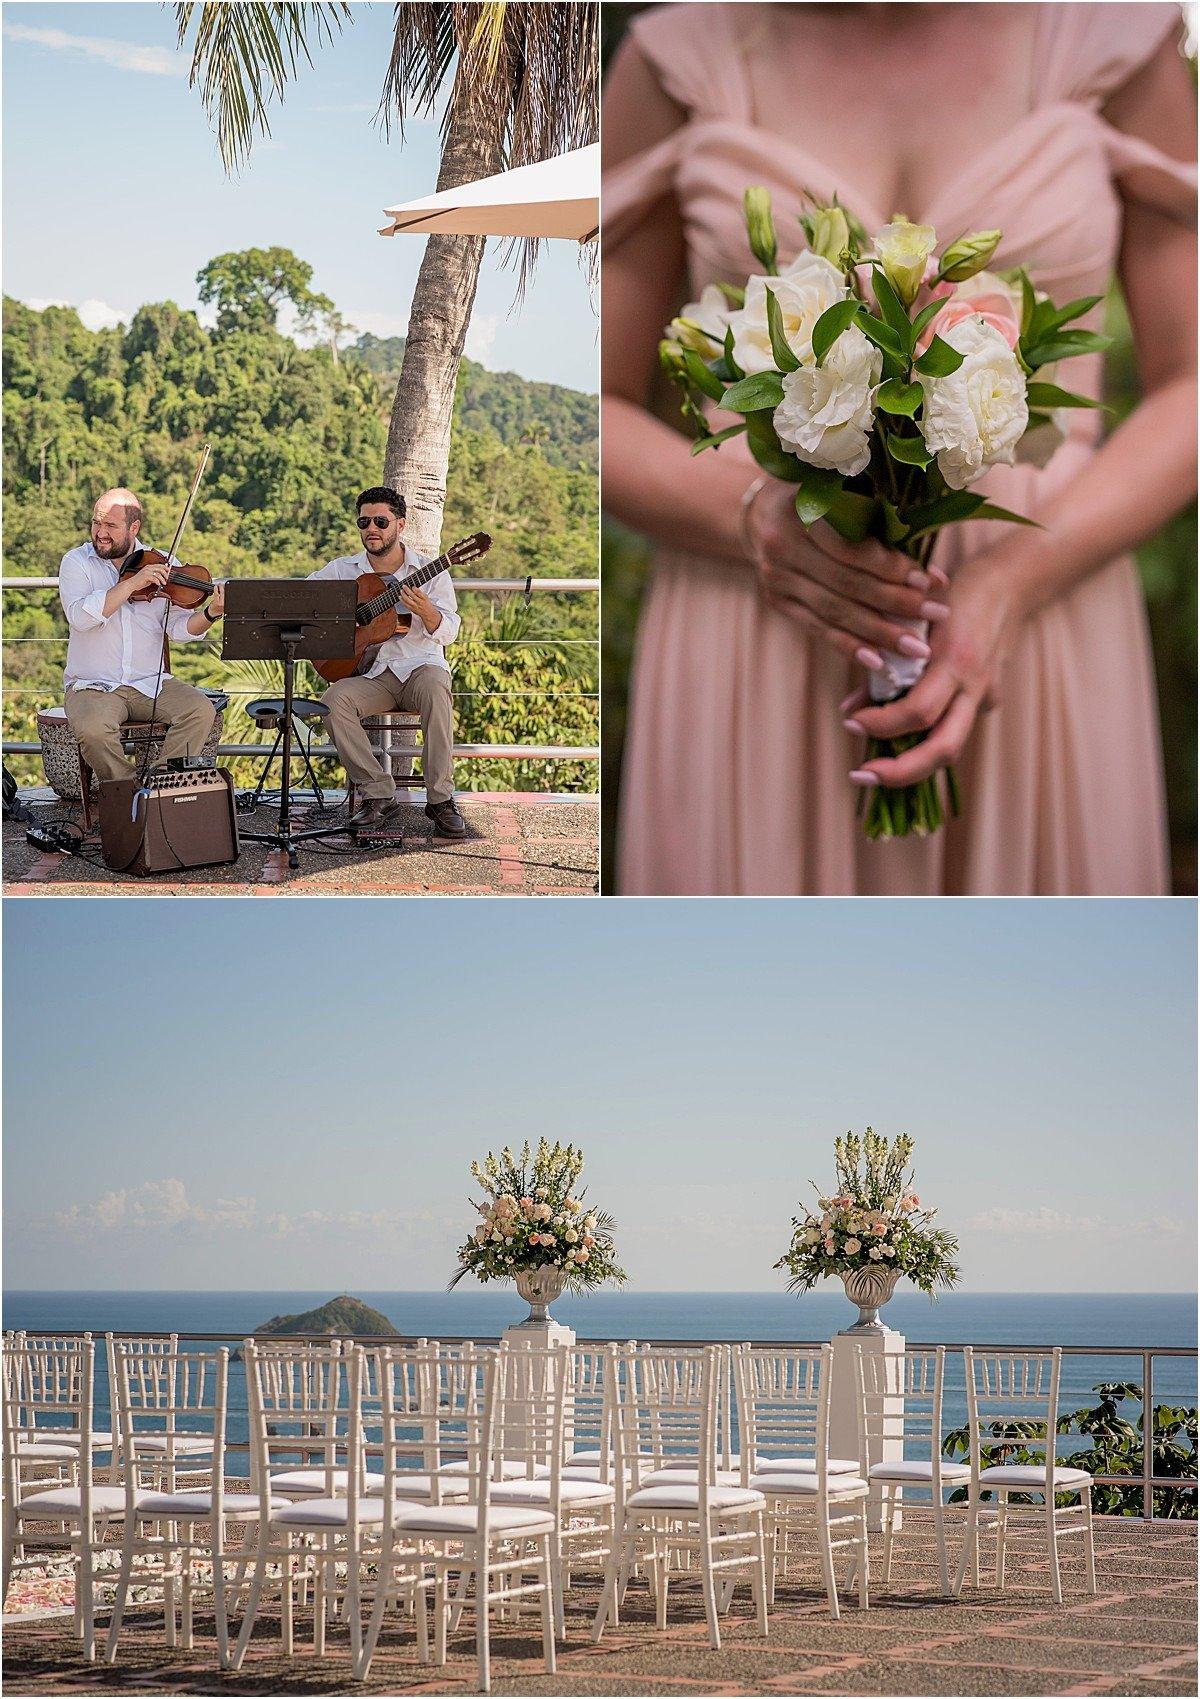 bridesmiads dress and ceremony in verde costa rica